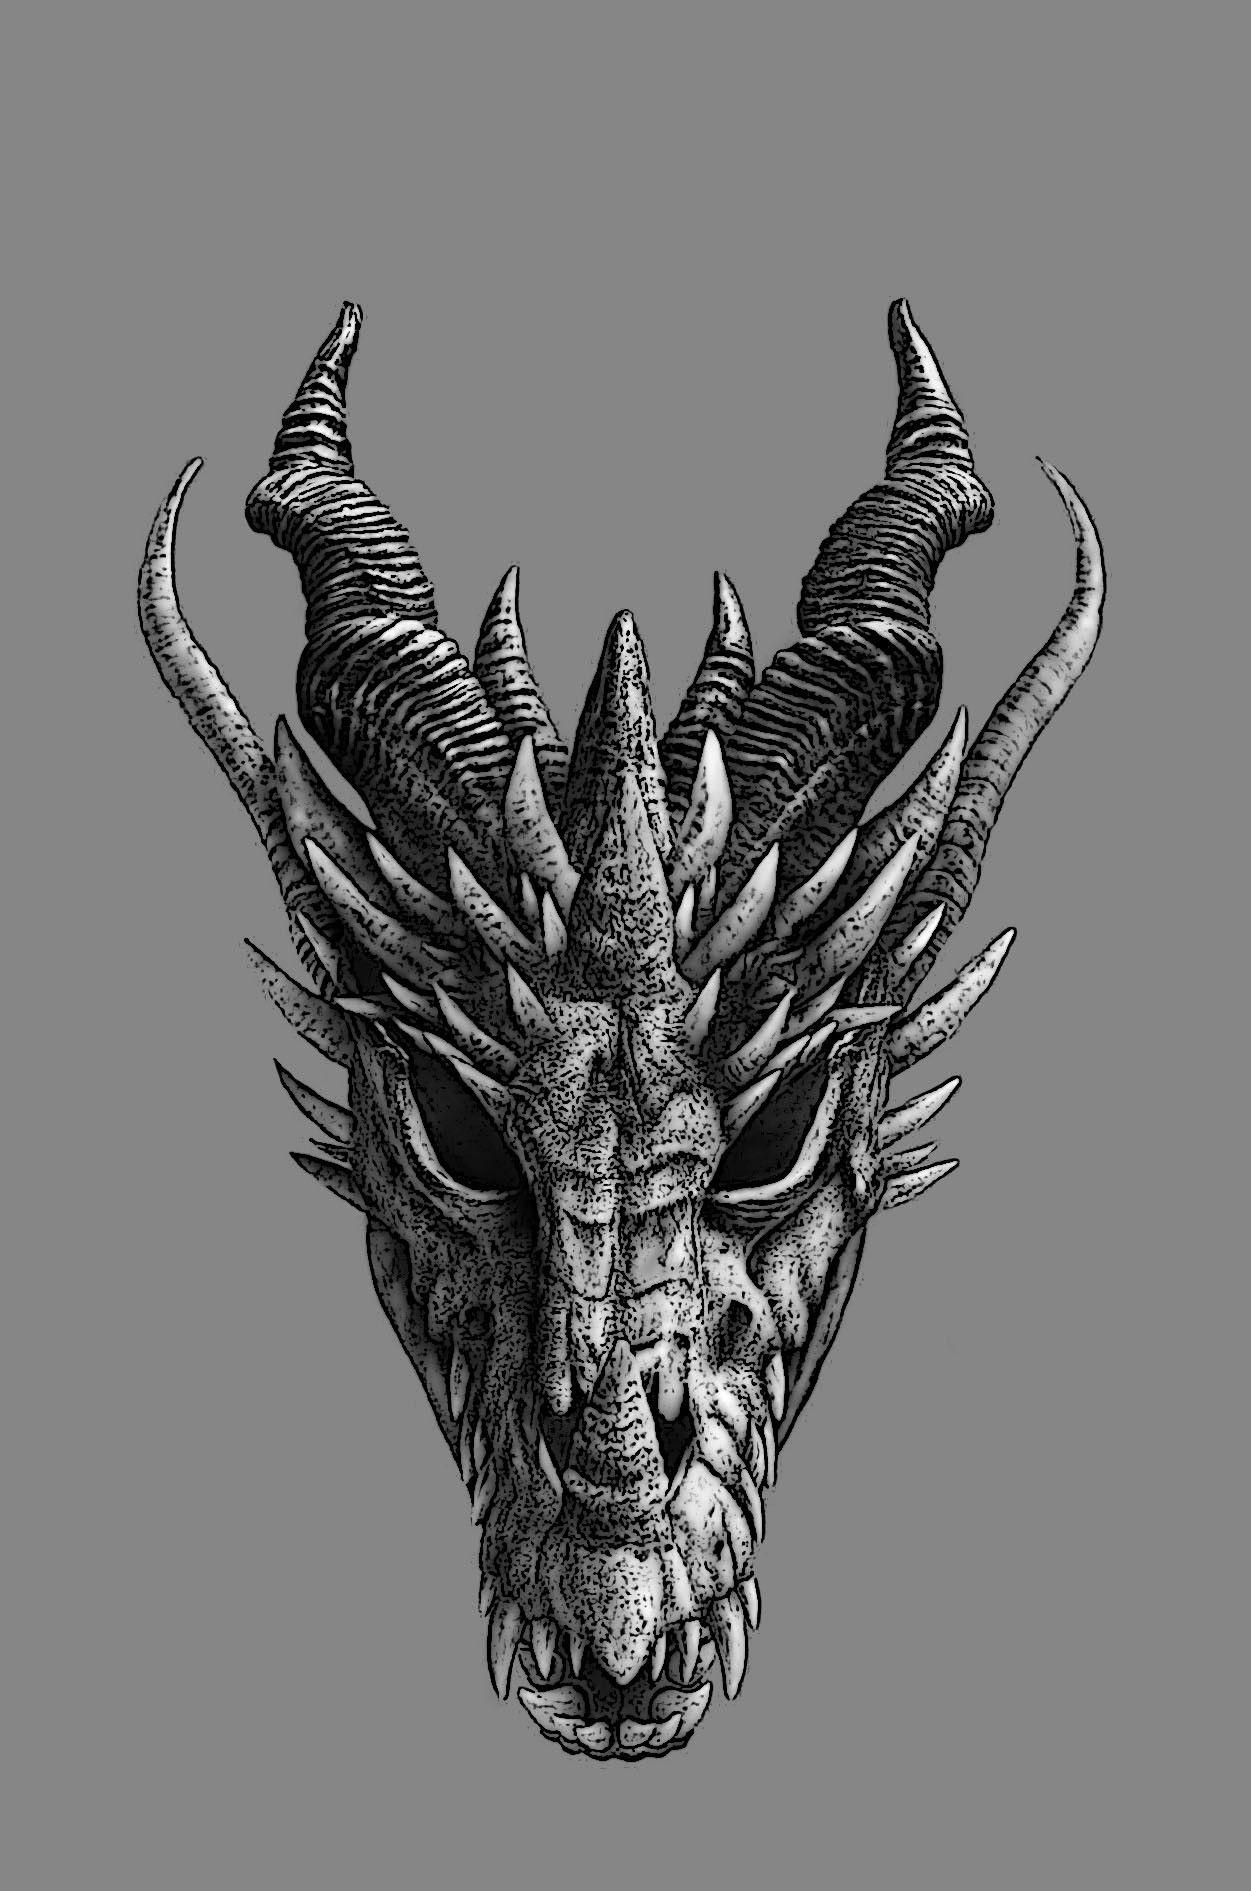 Cabezas De Dragones Para Tatuar pin de adriana garcia en dragones | dibujo de cabeza de